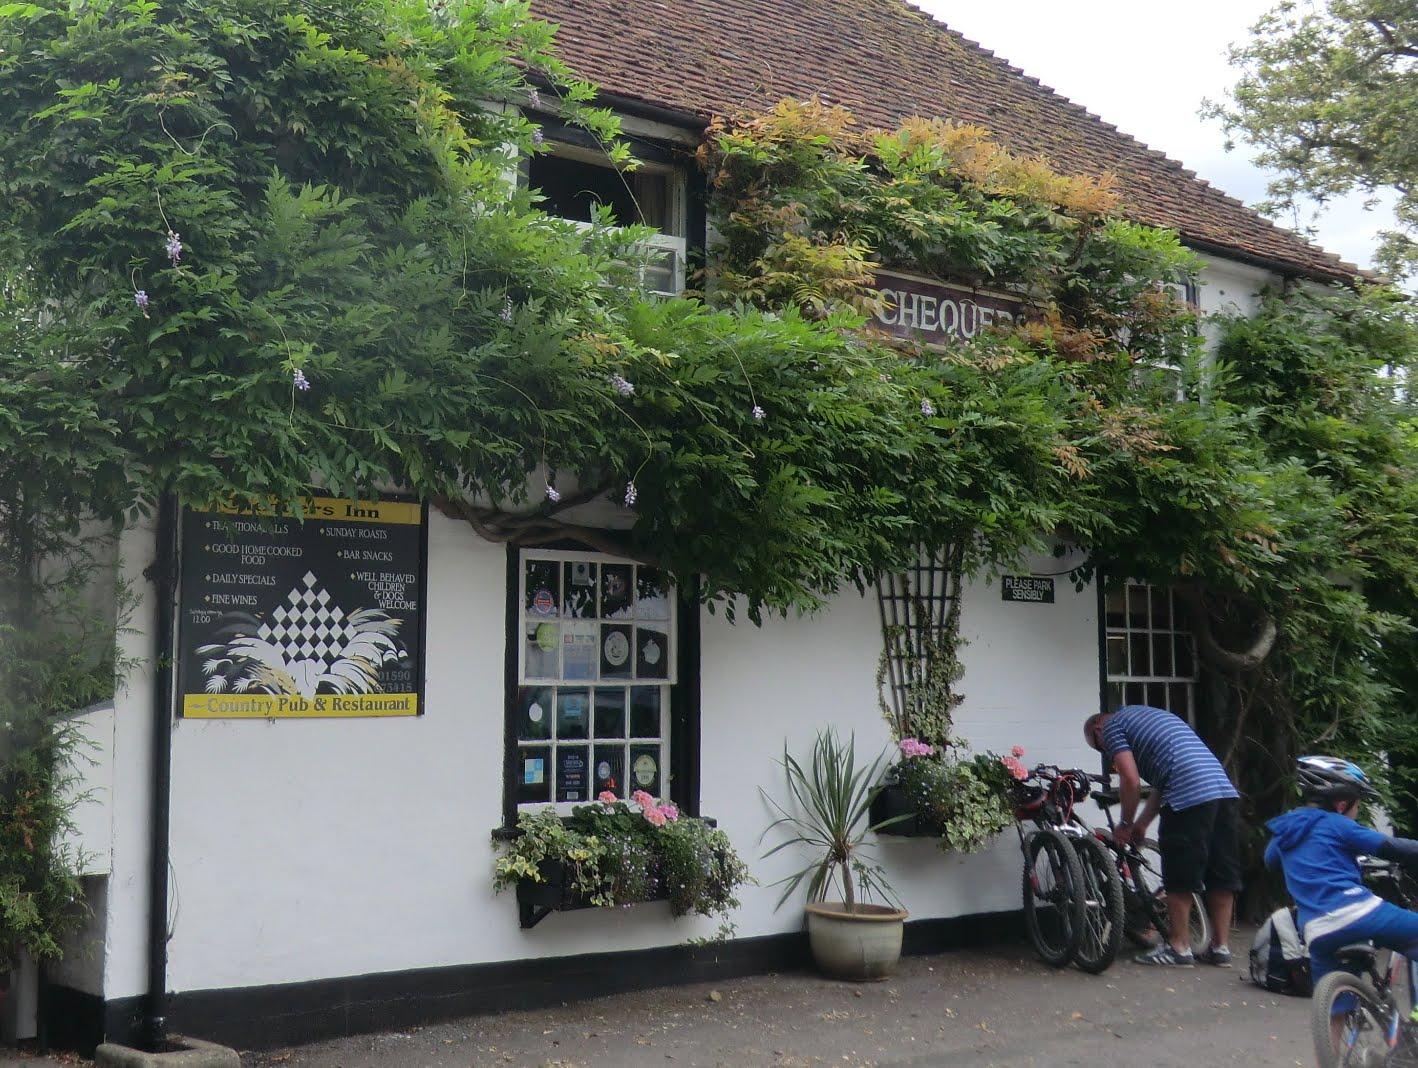 CIMG4464 Chequers Inn, Lower Pennington